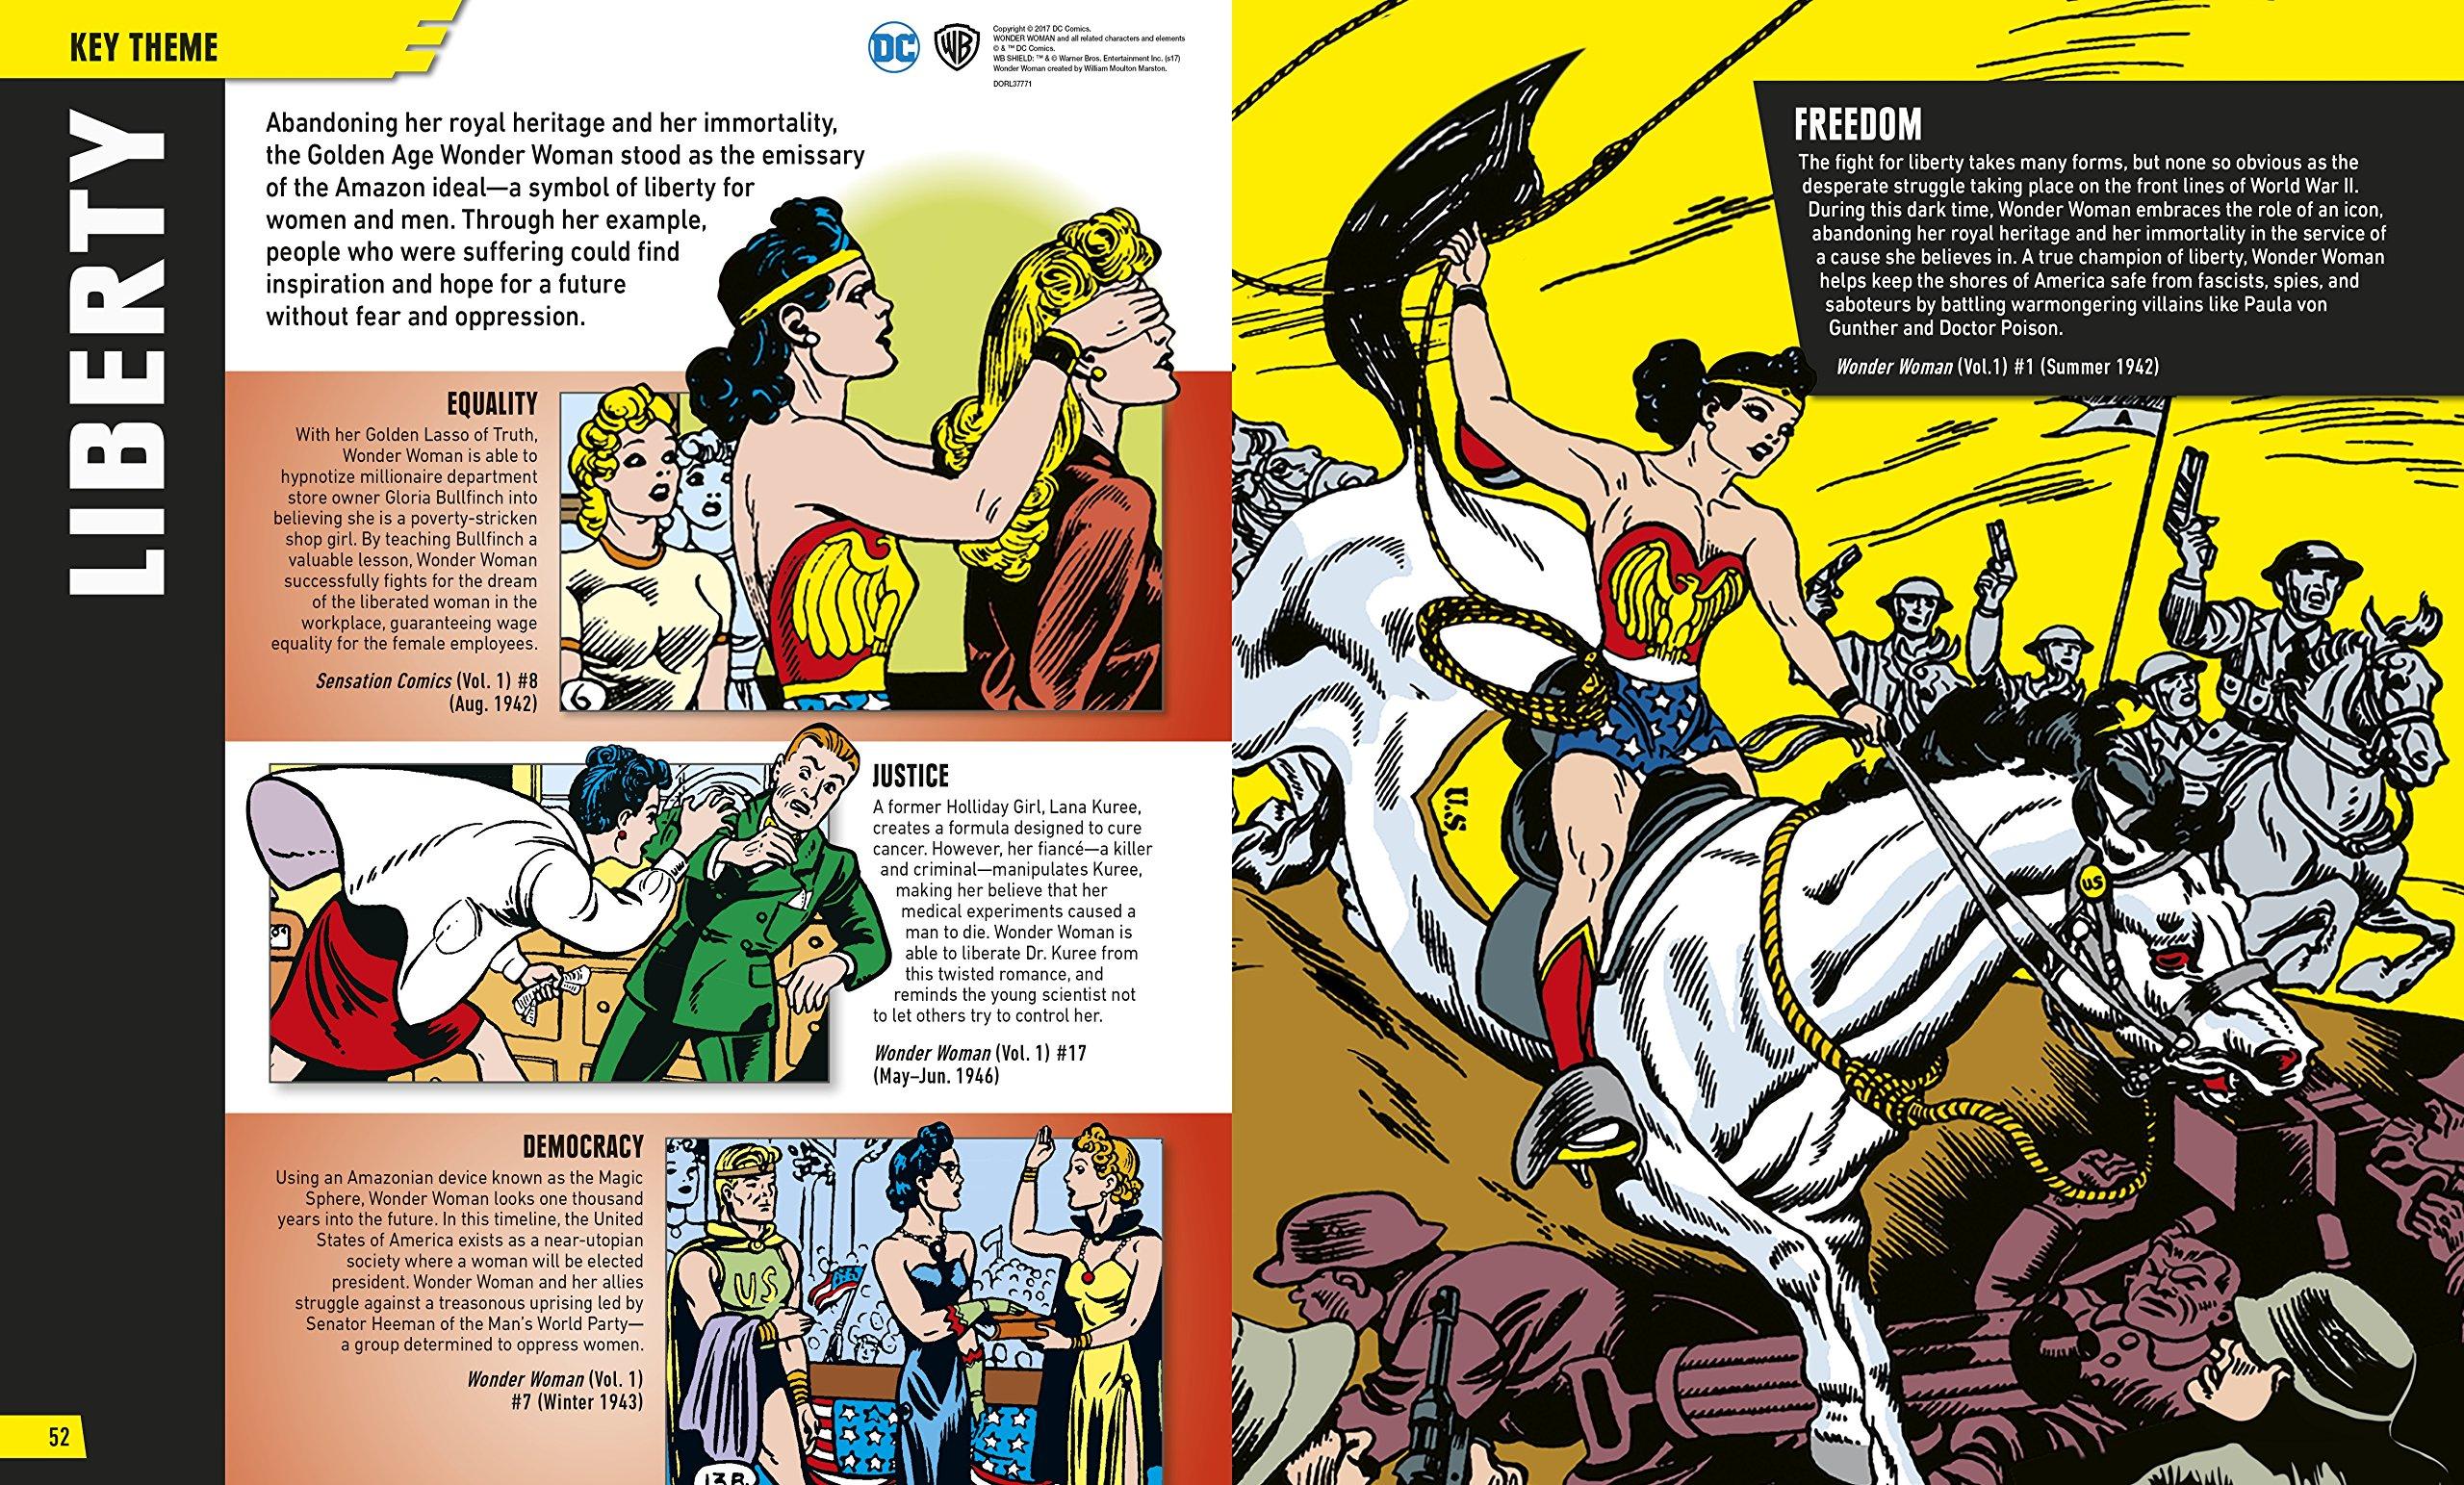 edcaf9b1 Amazon.com: DC Comics Wonder Woman: The Ultimate Guide to the Amazon  Warrior (9781465460721): Landry Q. Walker: Books